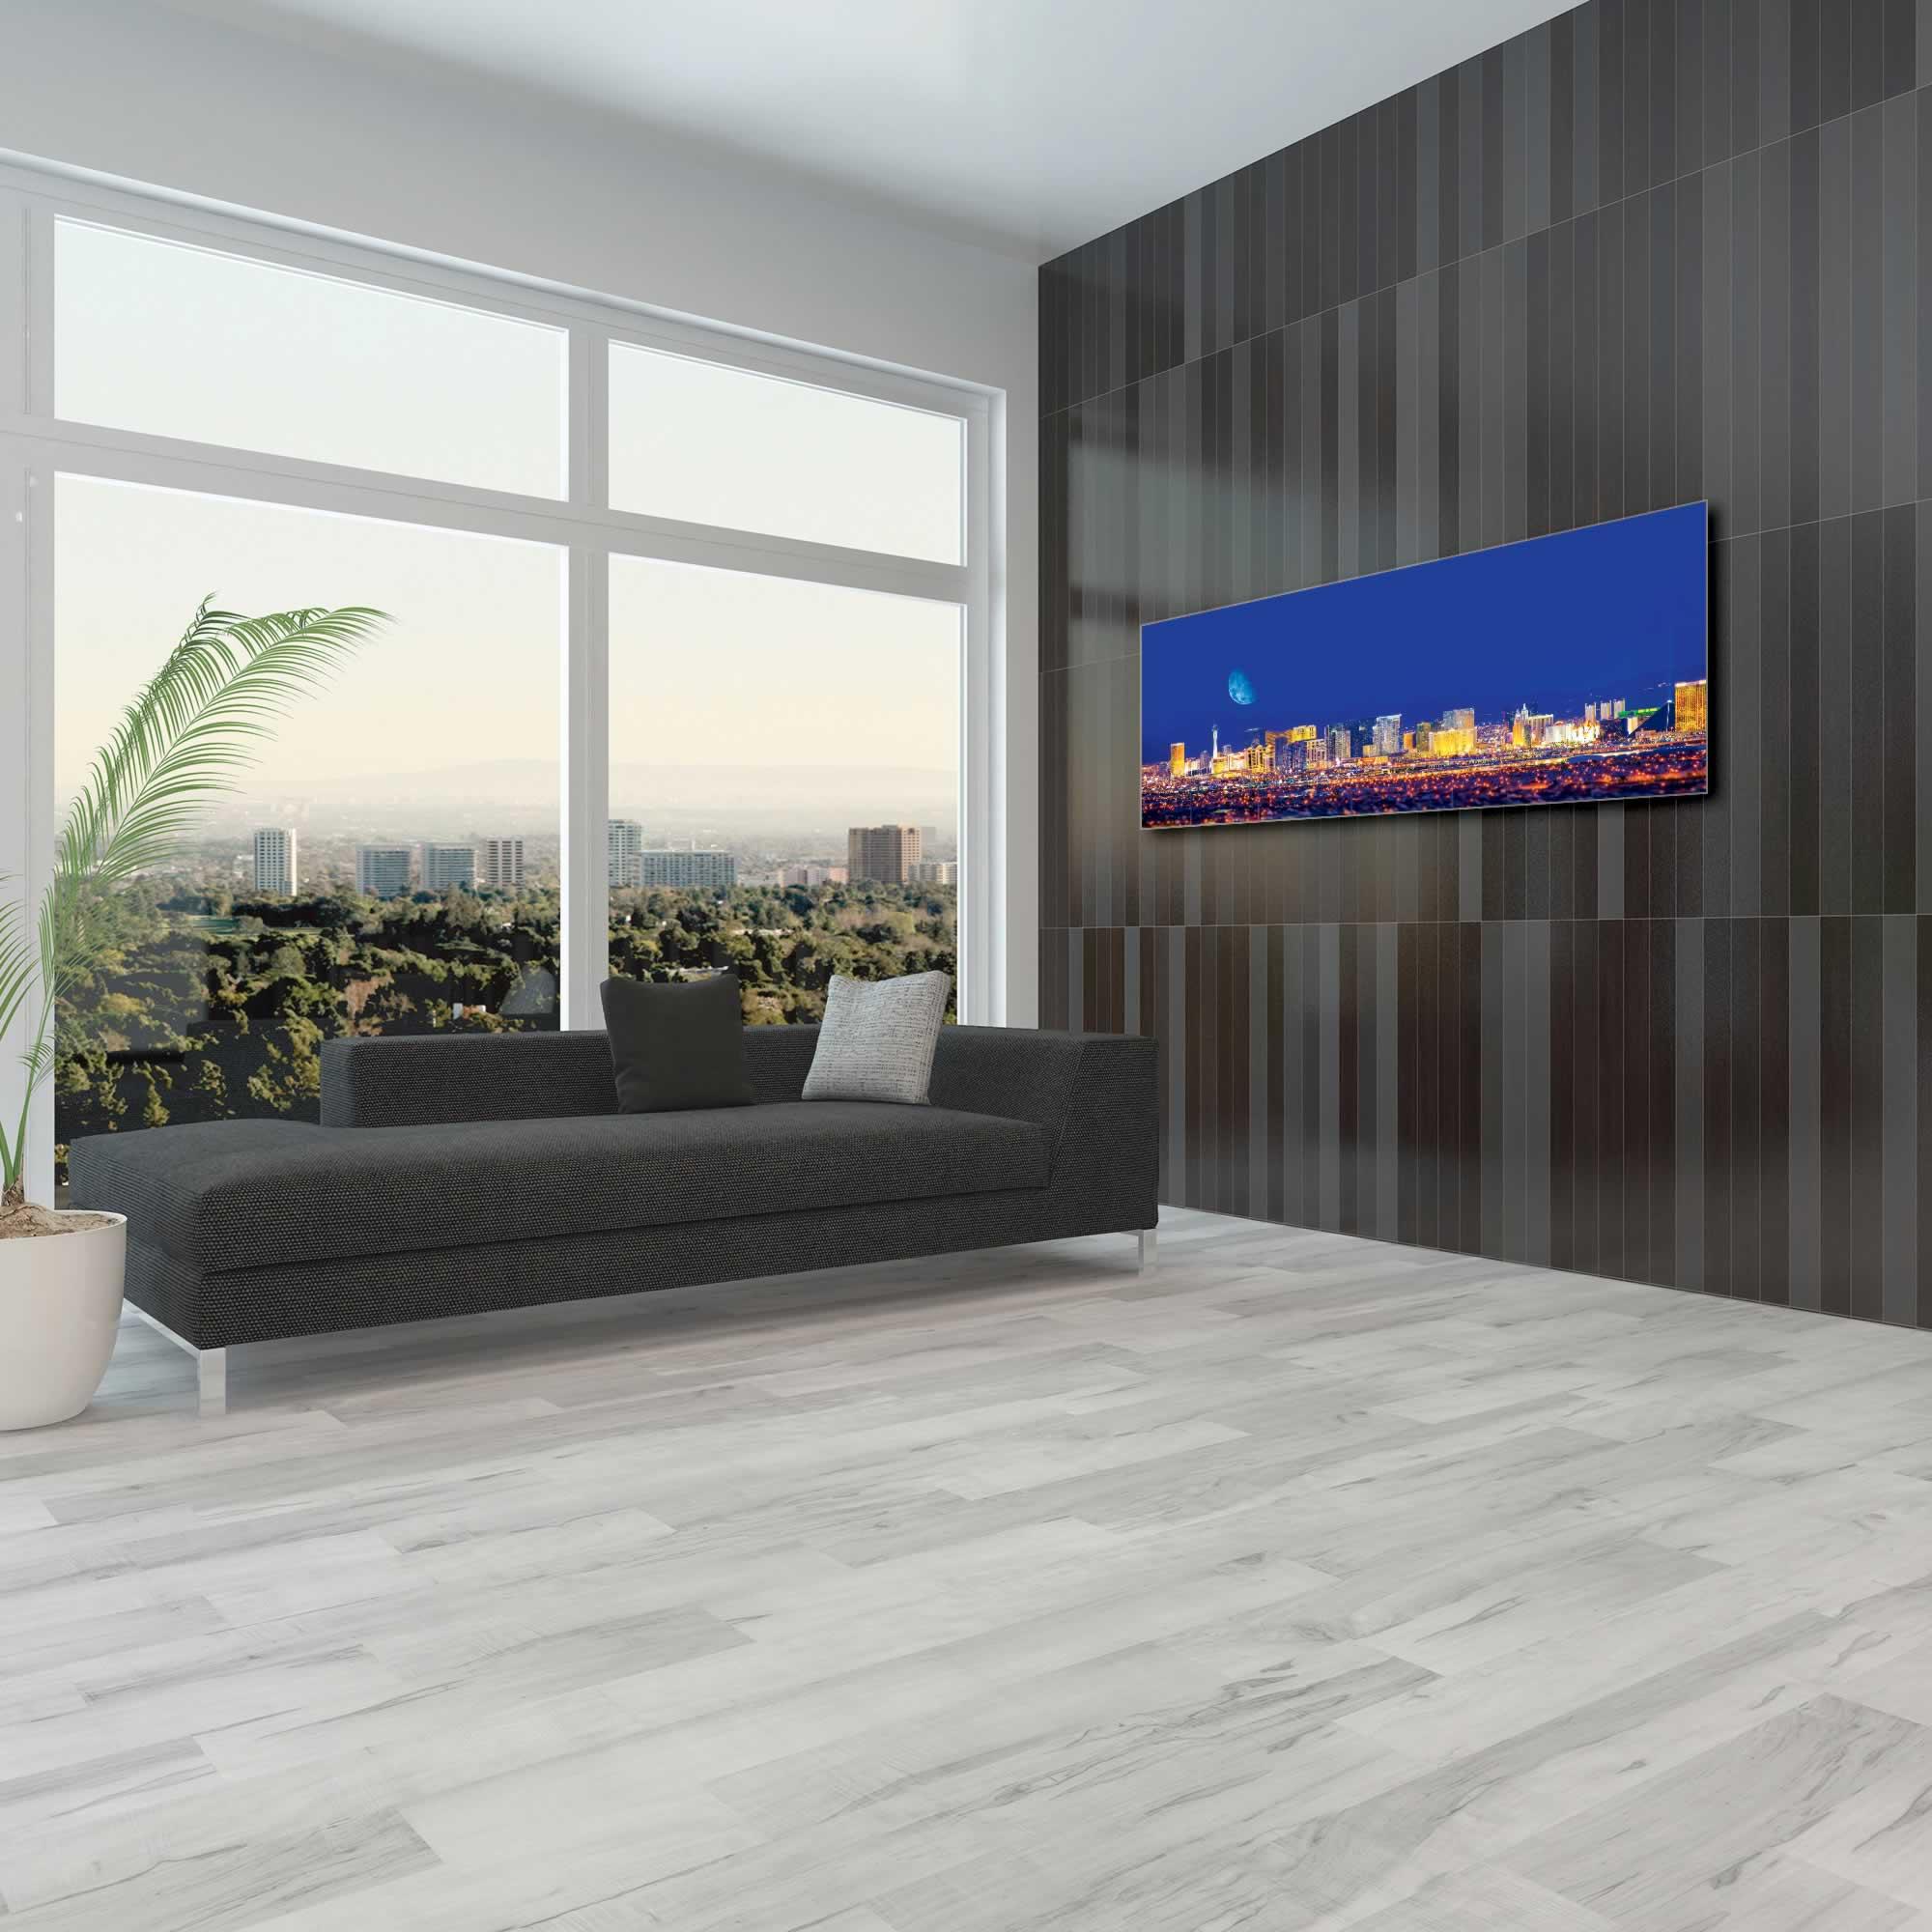 Las Vegas City Skyline - Urban Modern Art, Designer Home Decor, Cityscape Wall Artwork, Trendy Contemporary Art - Alternate View 1